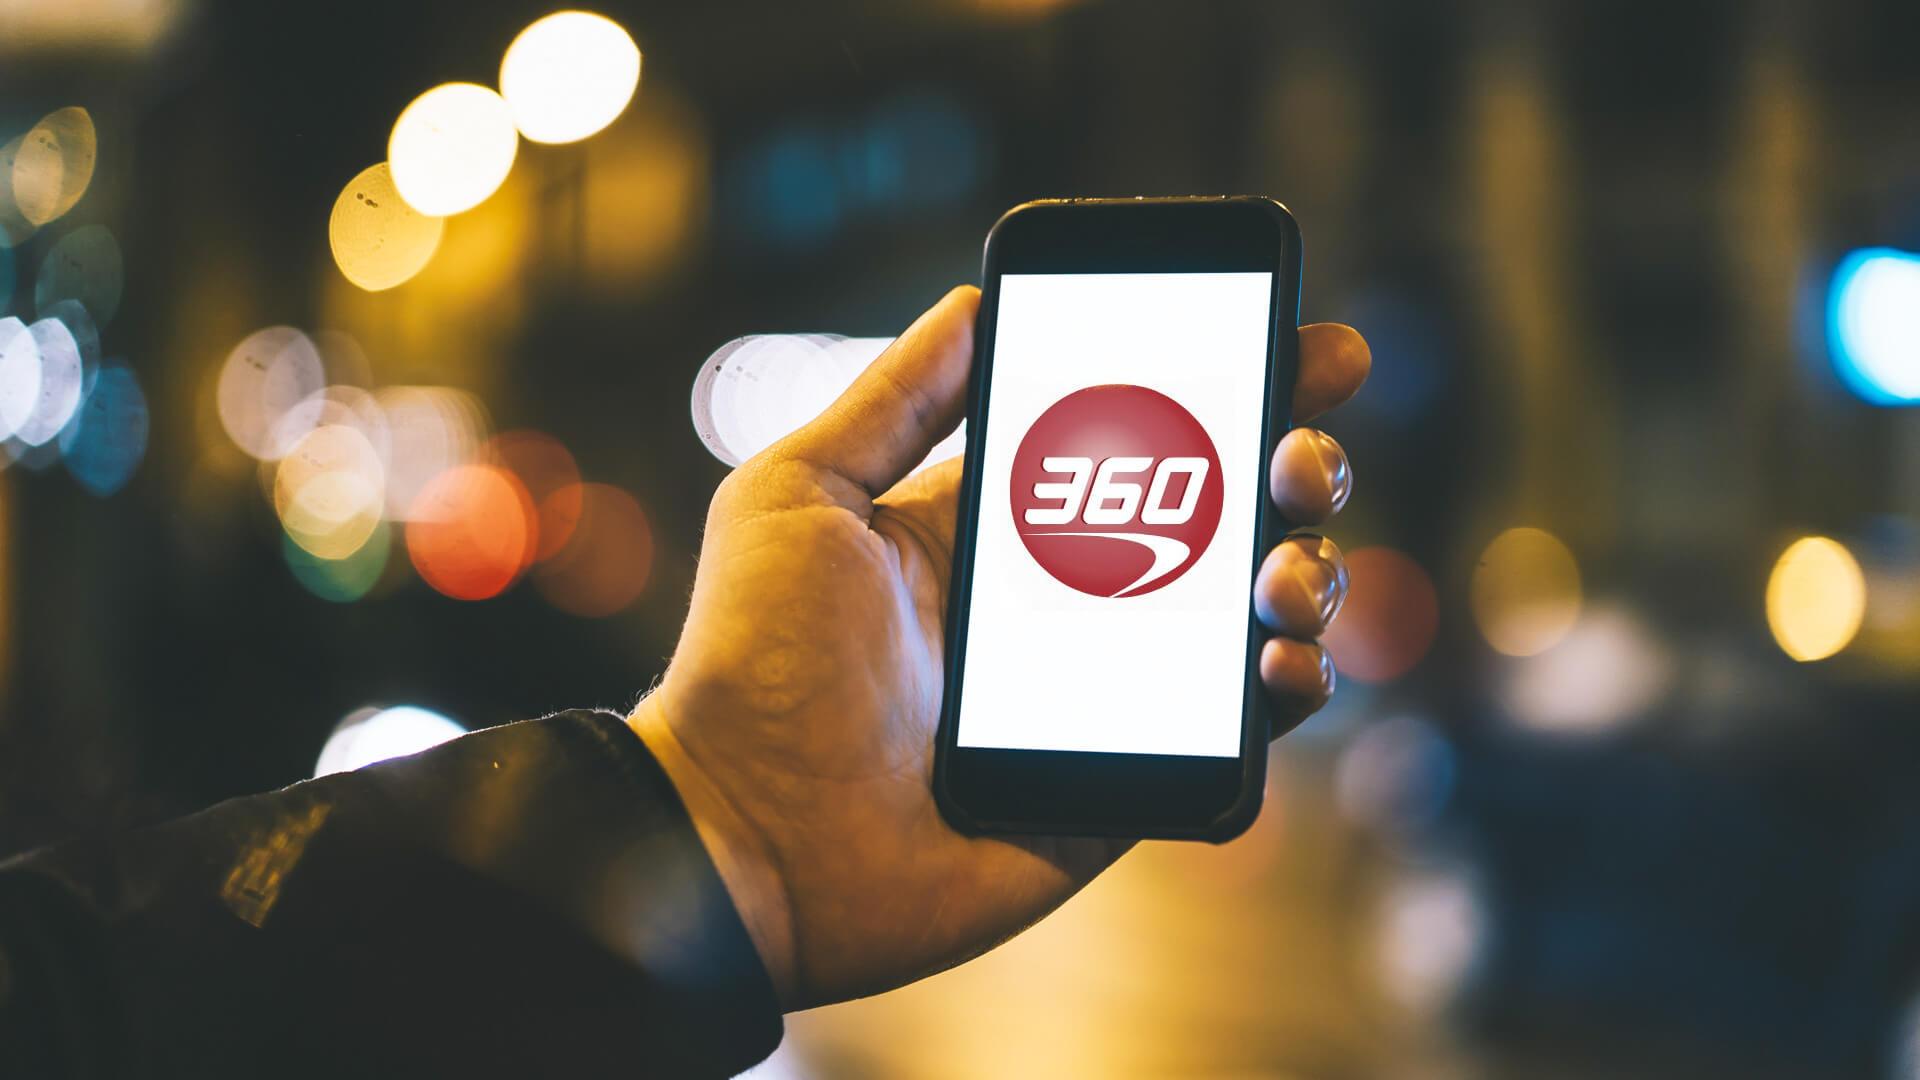 Capital One 360 bank logo